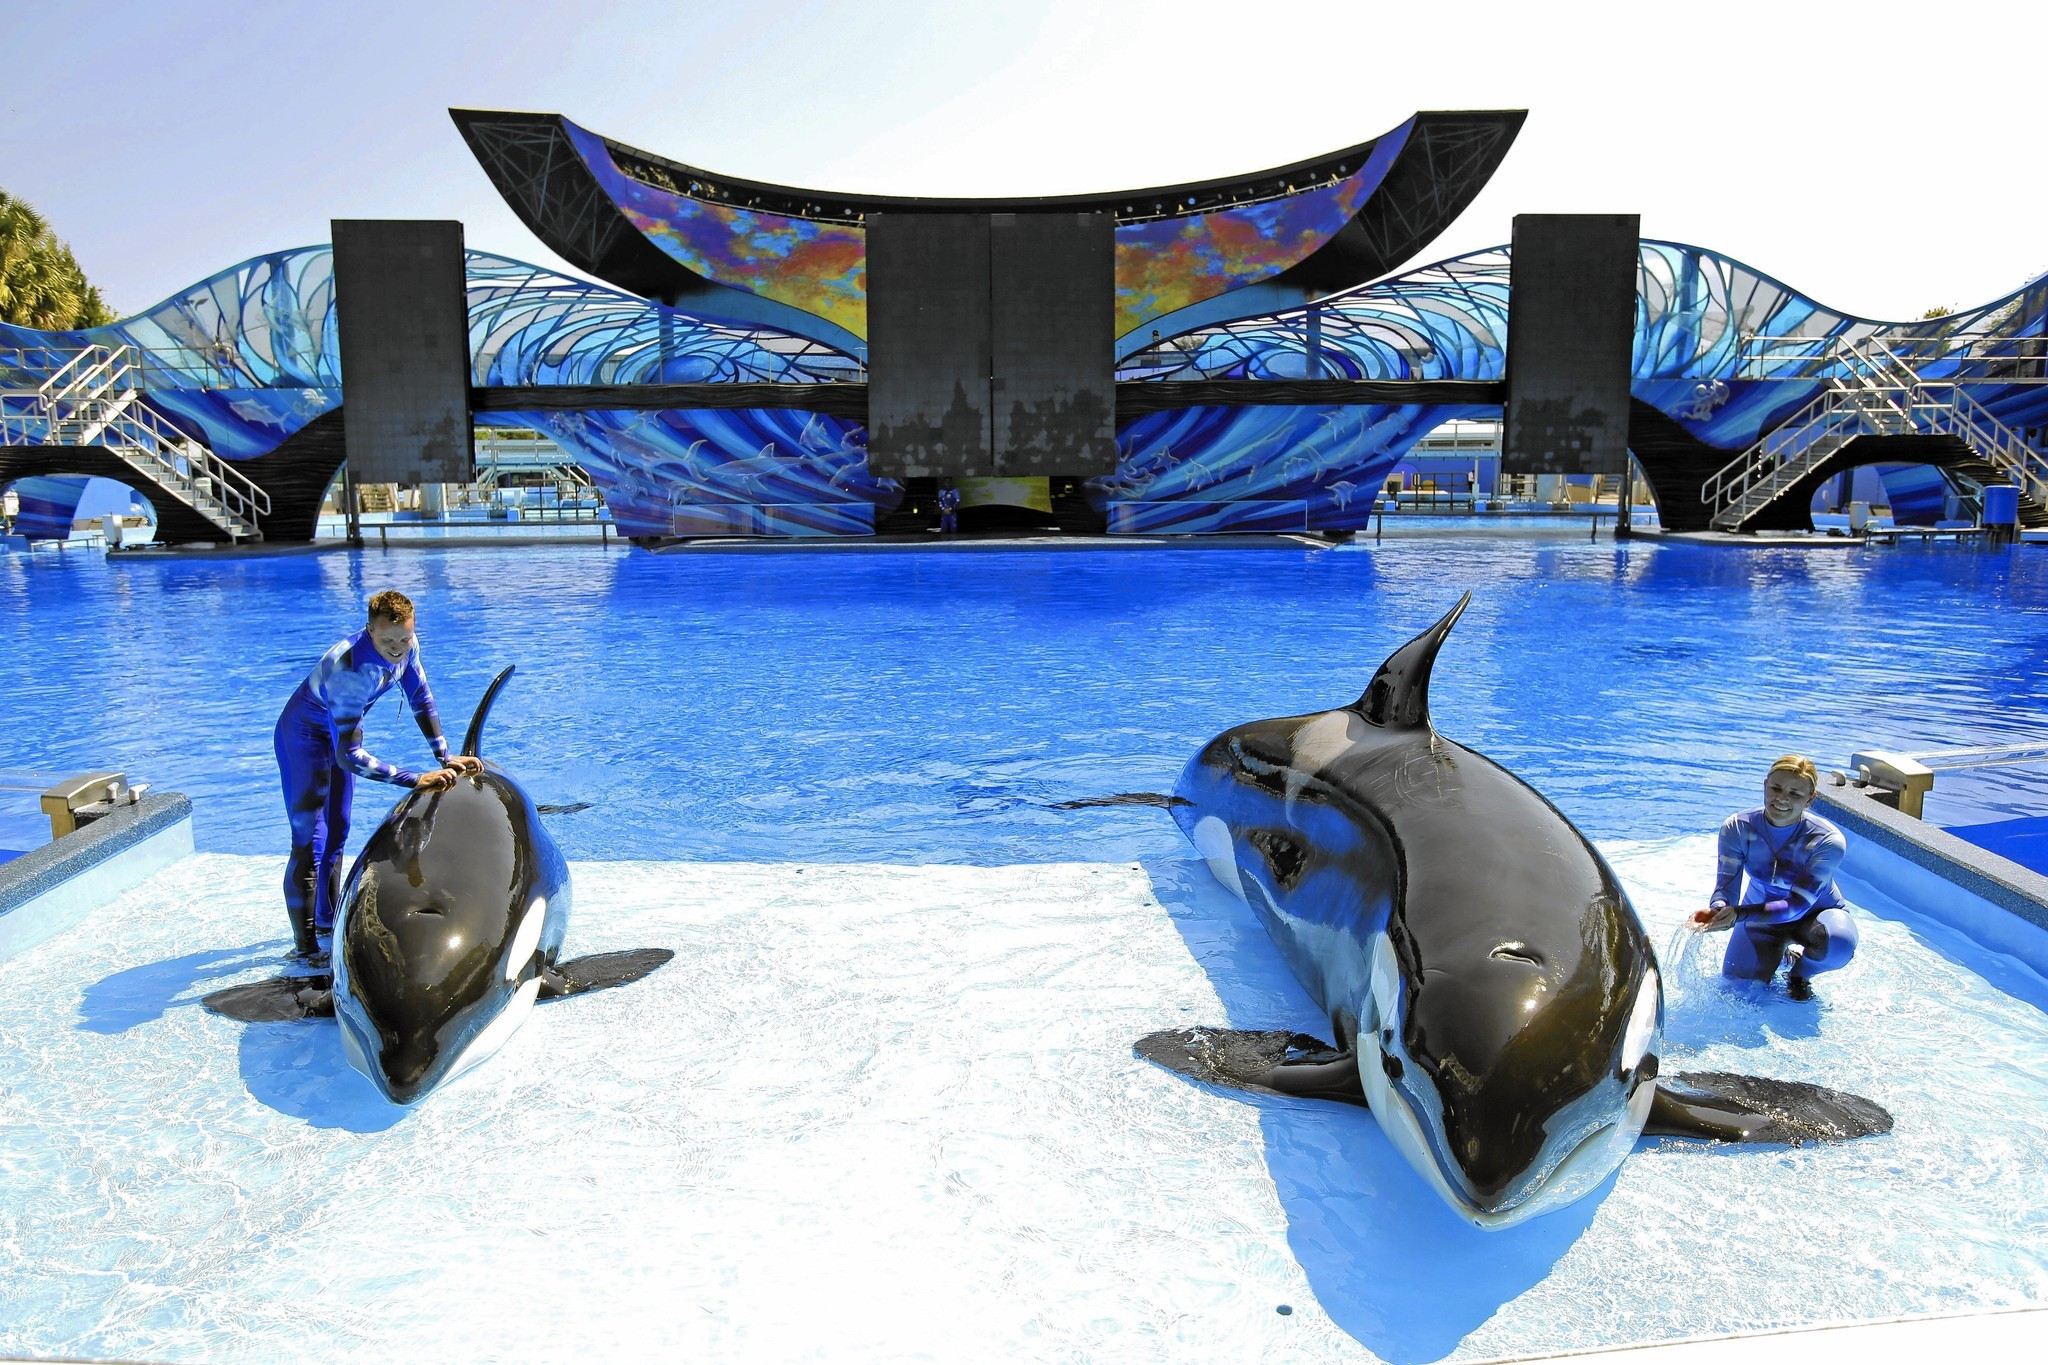 Seaworld to open new attraction in bid to reverse declining attendance la times